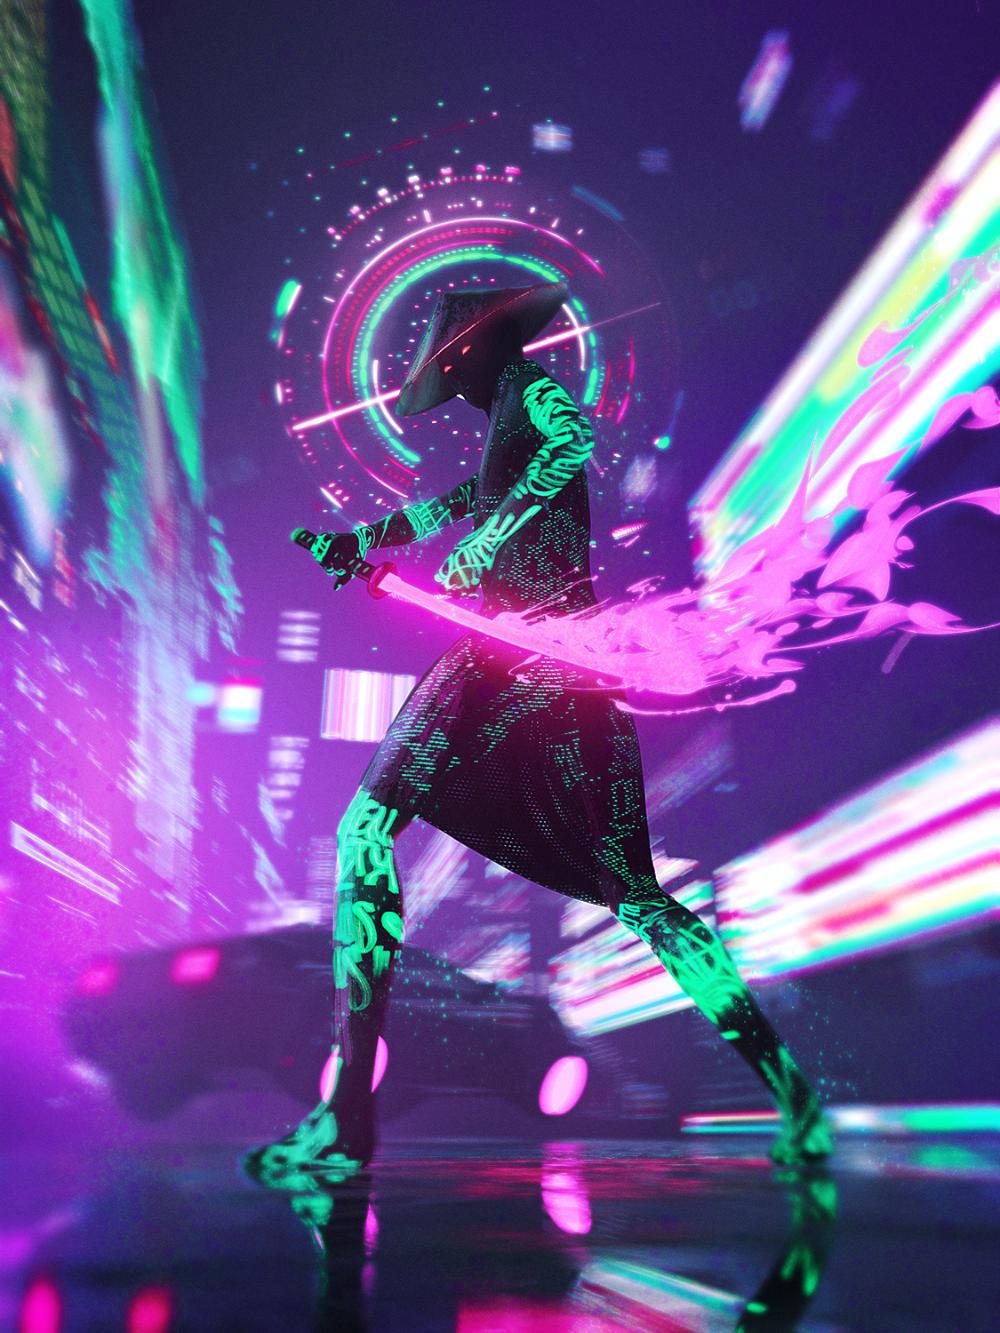 Vertical Neon Cyberpunk Futuristic Samurai Cinema 4d Science Fiction 1125x1500 Wallpaper Samurai Wallpaper Cyberpunk Aesthetic Samurai Artwork